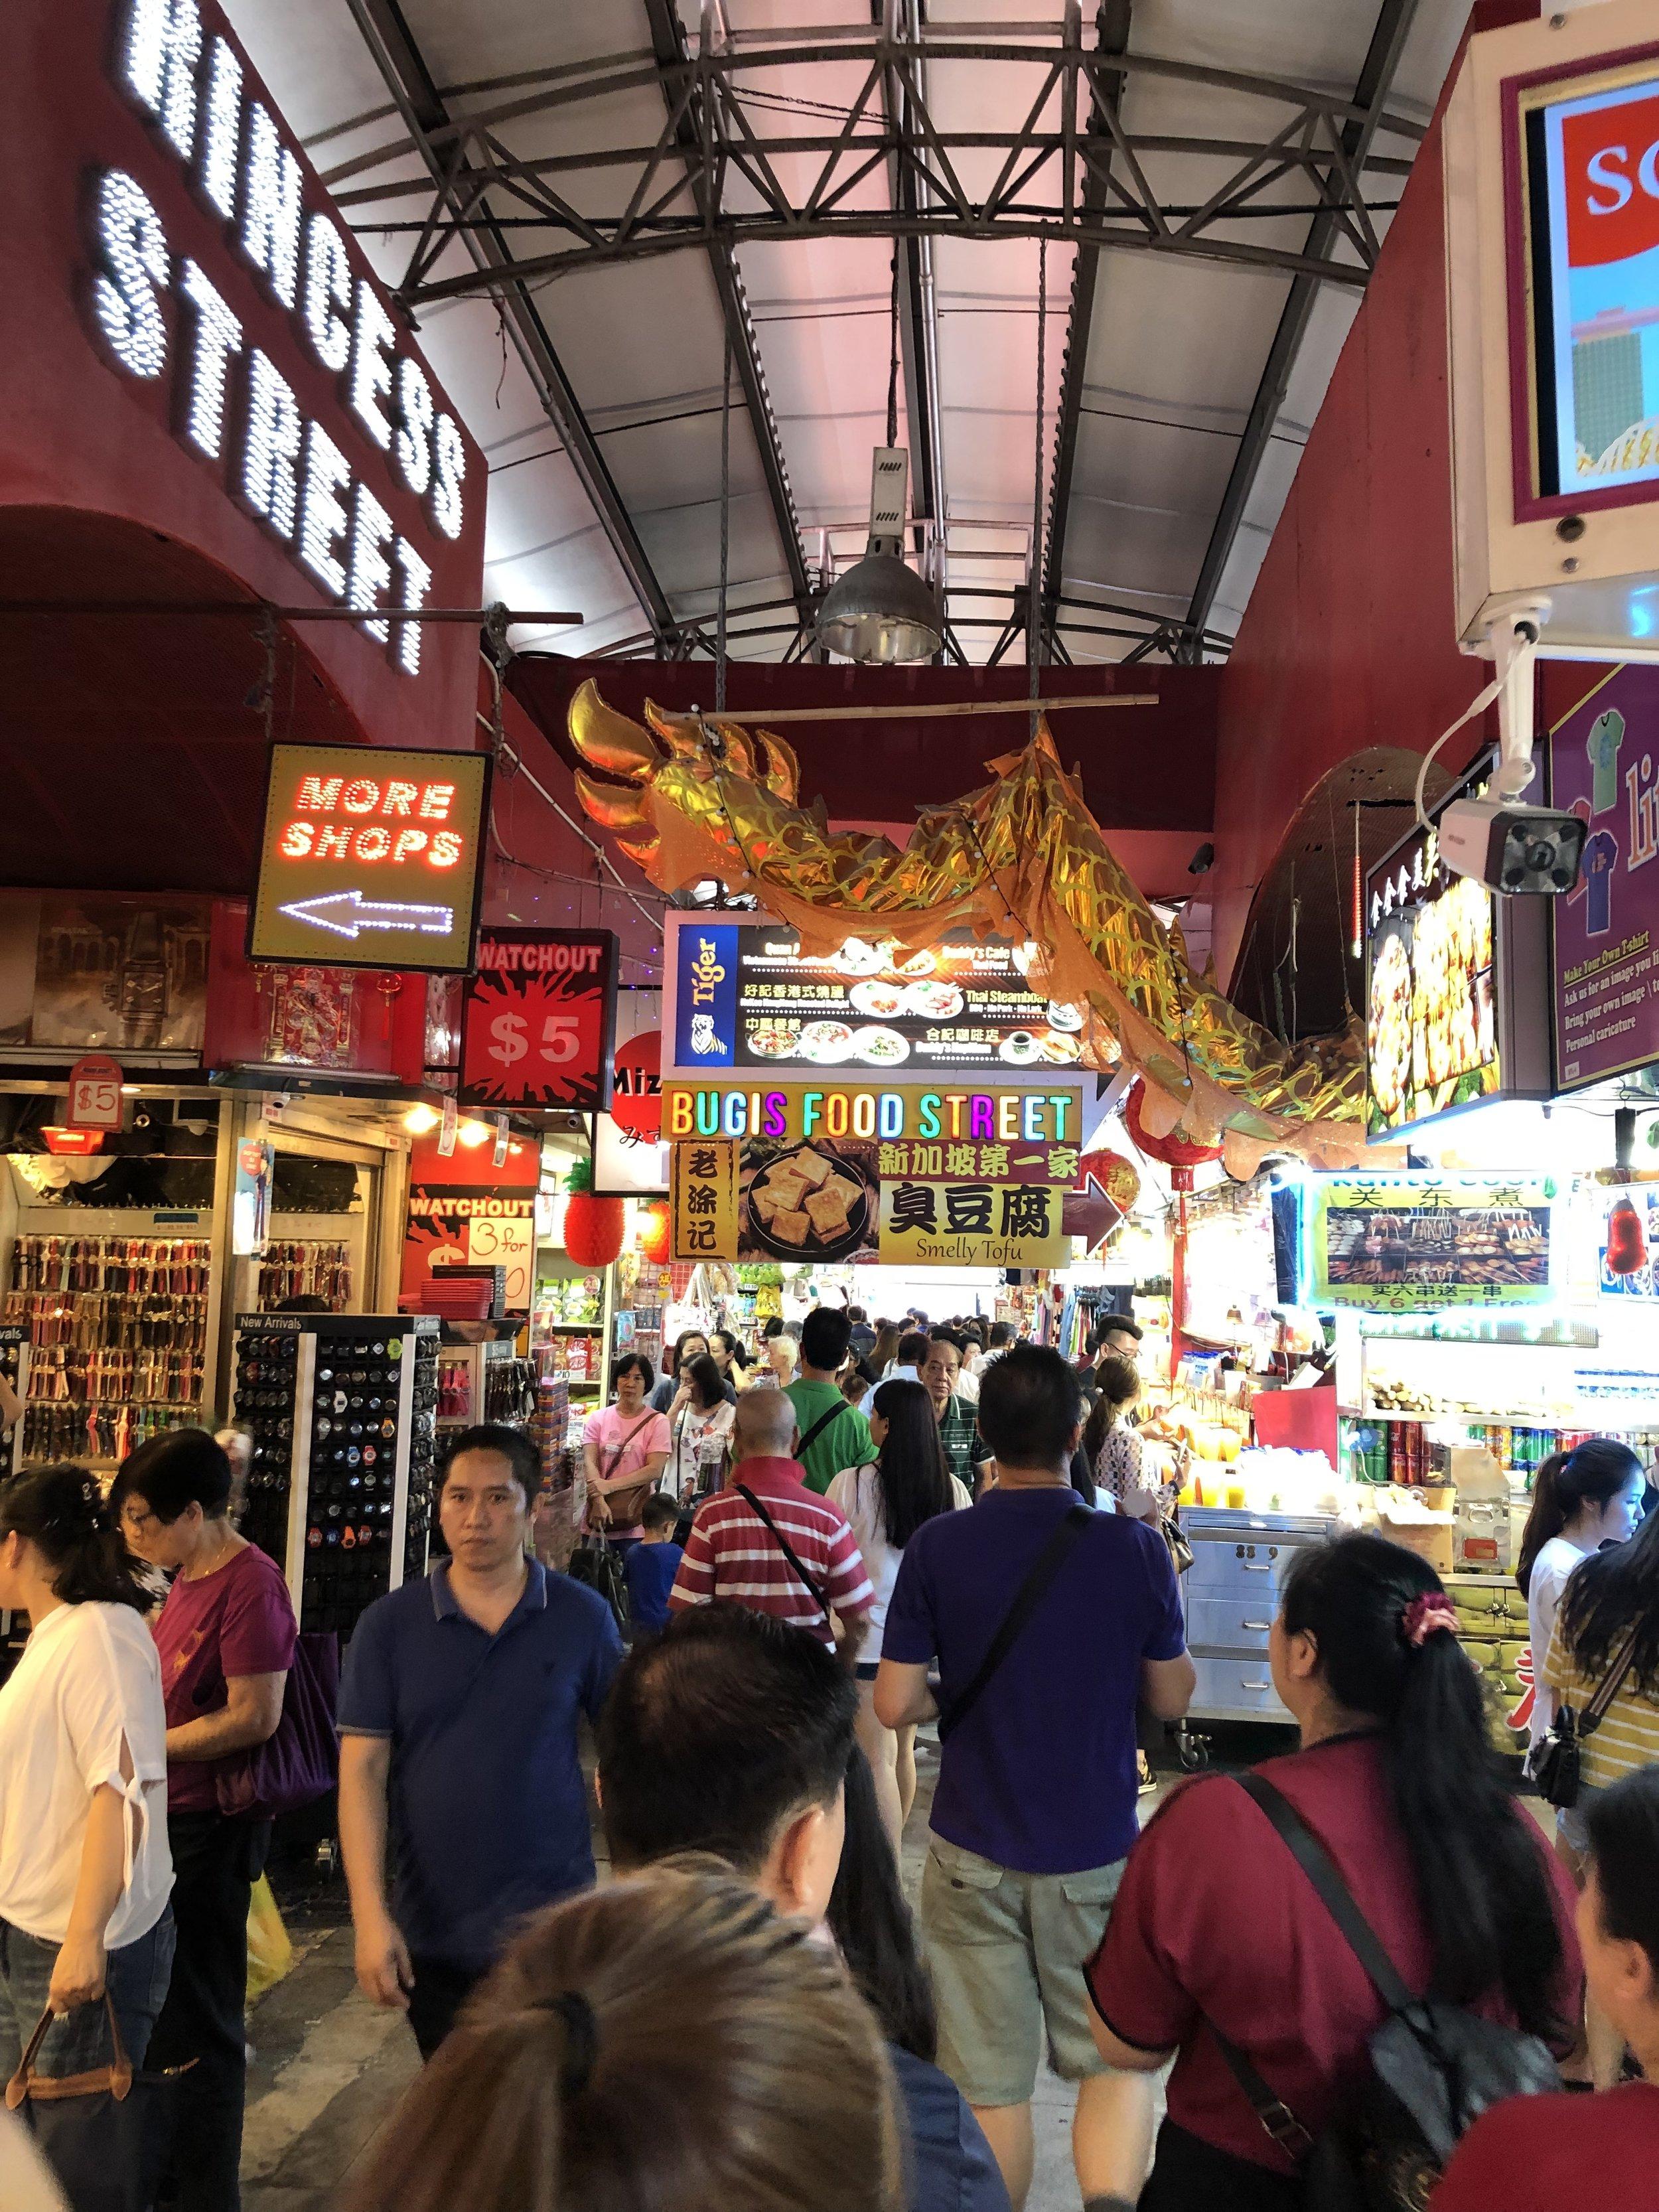 Bugis Street Market, SG